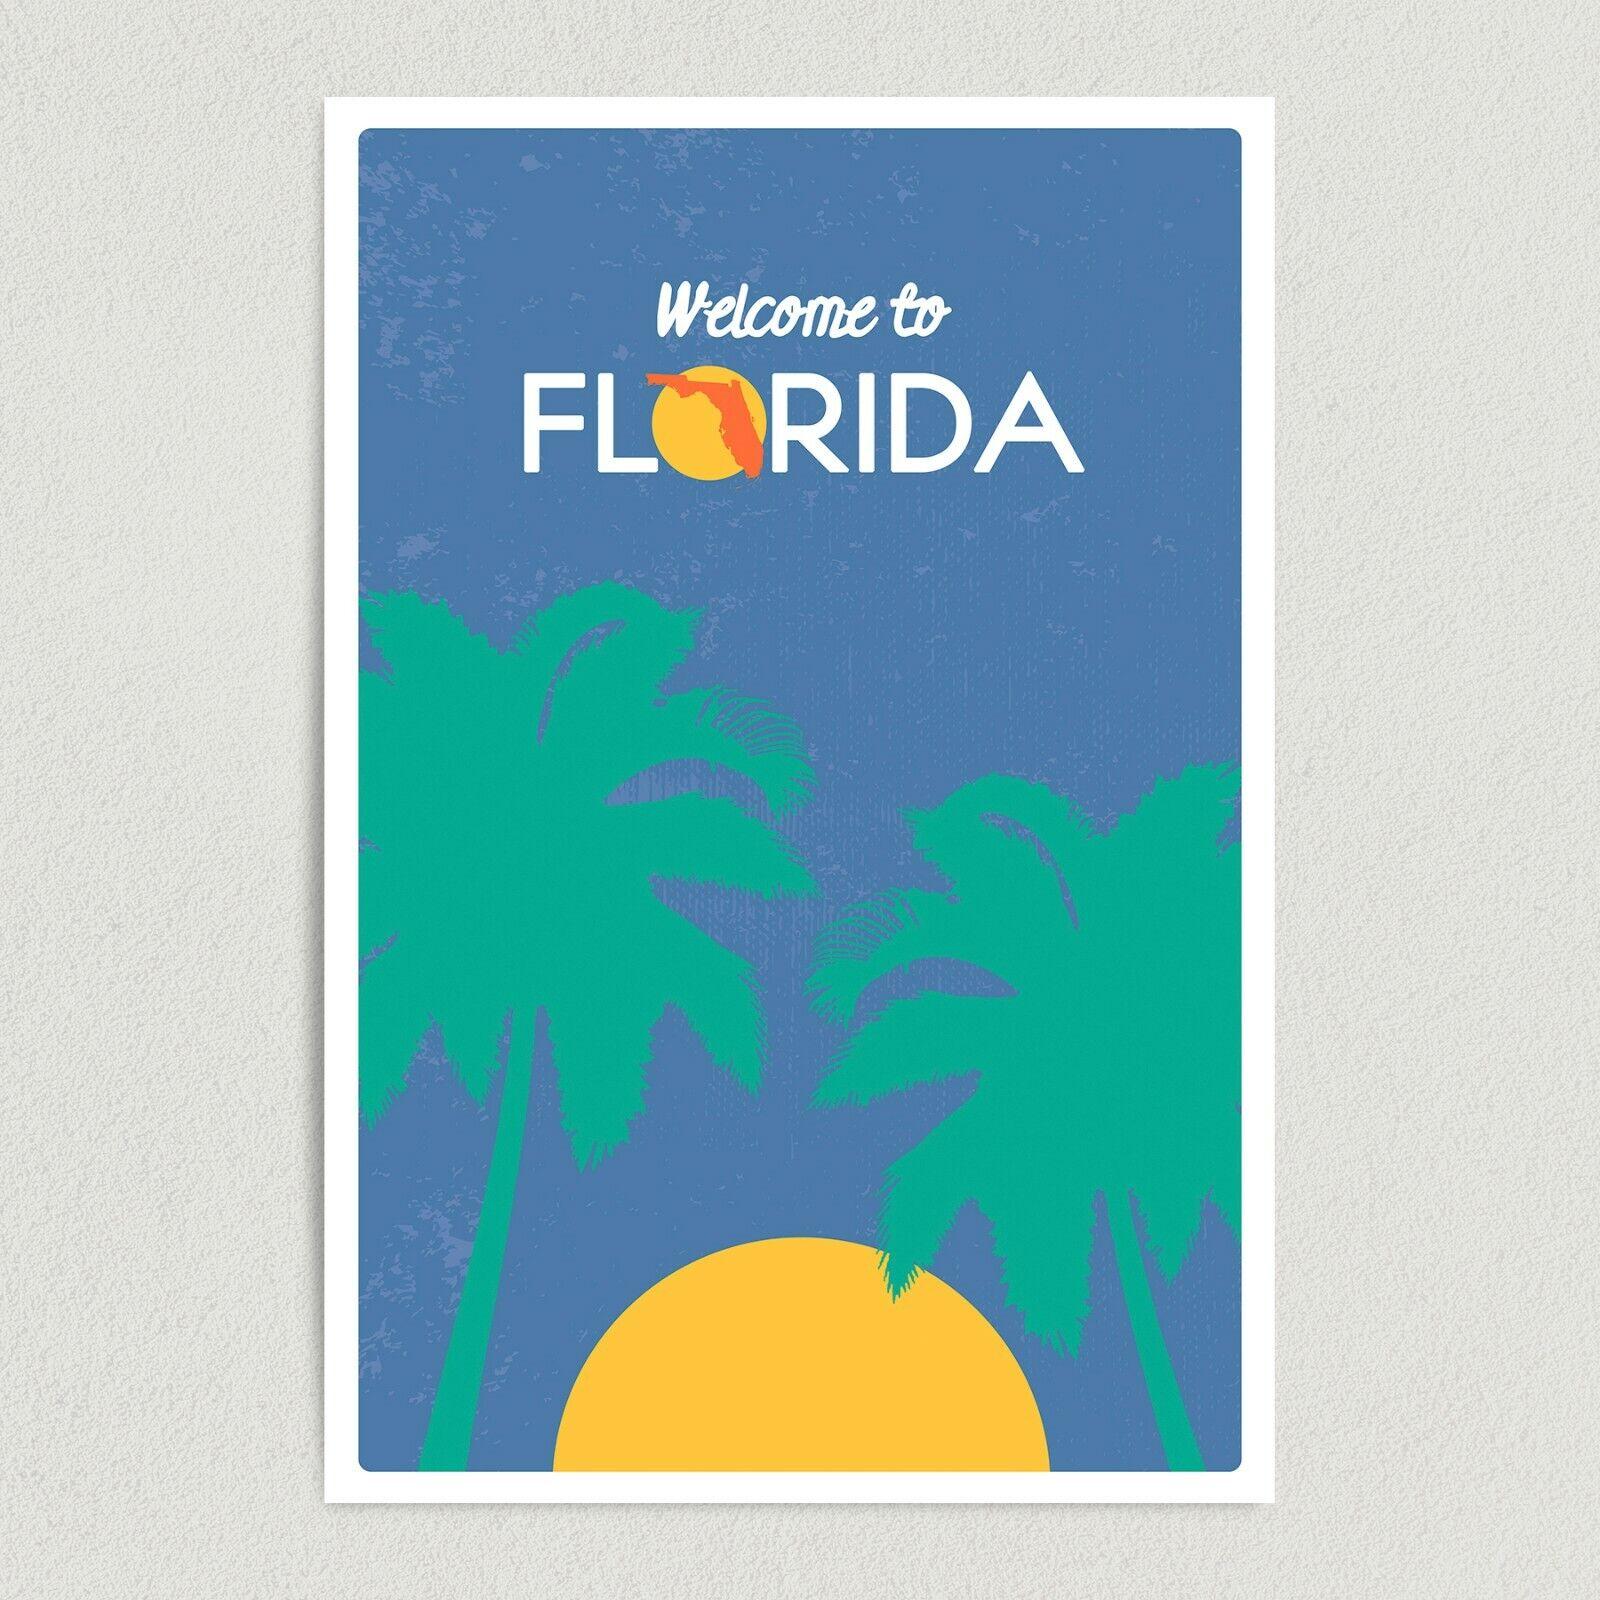 ArtPrintJoy Welcome To Florida Sign Art Print Poster 12 X 18 Wall Art S1000 - $11.99